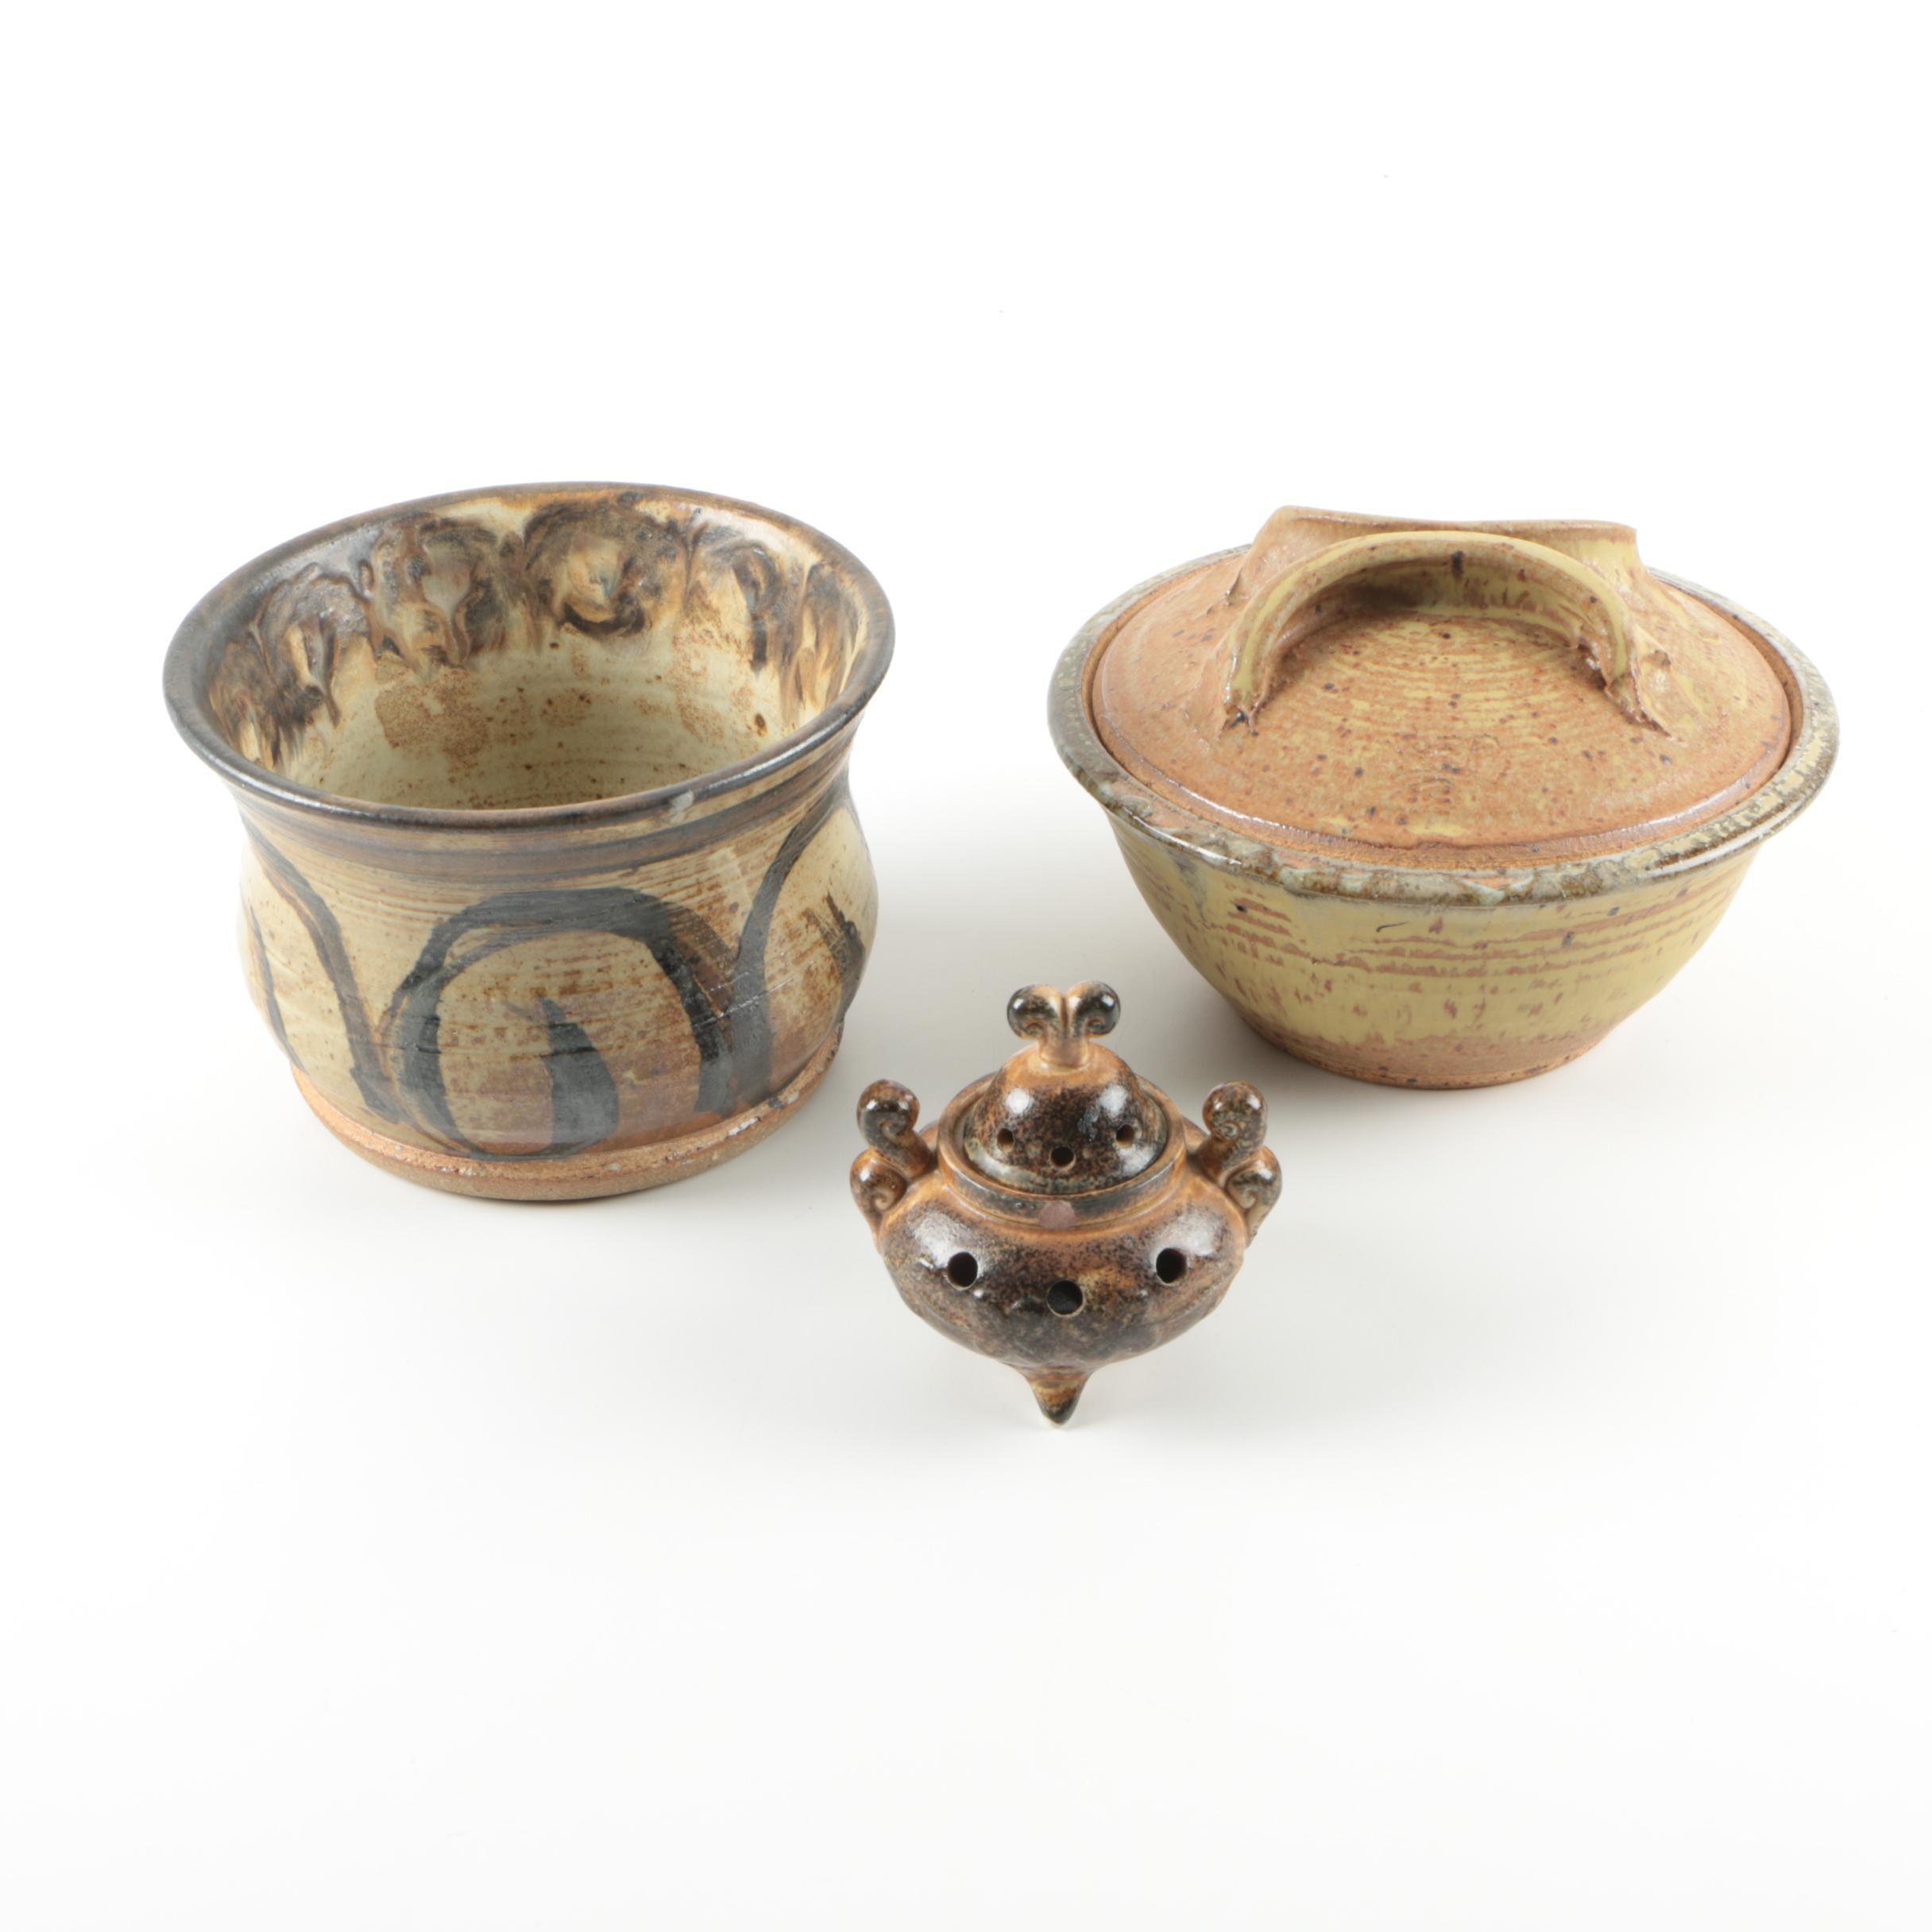 Hand Thrown Stoneware Glazed Planter and Bowl